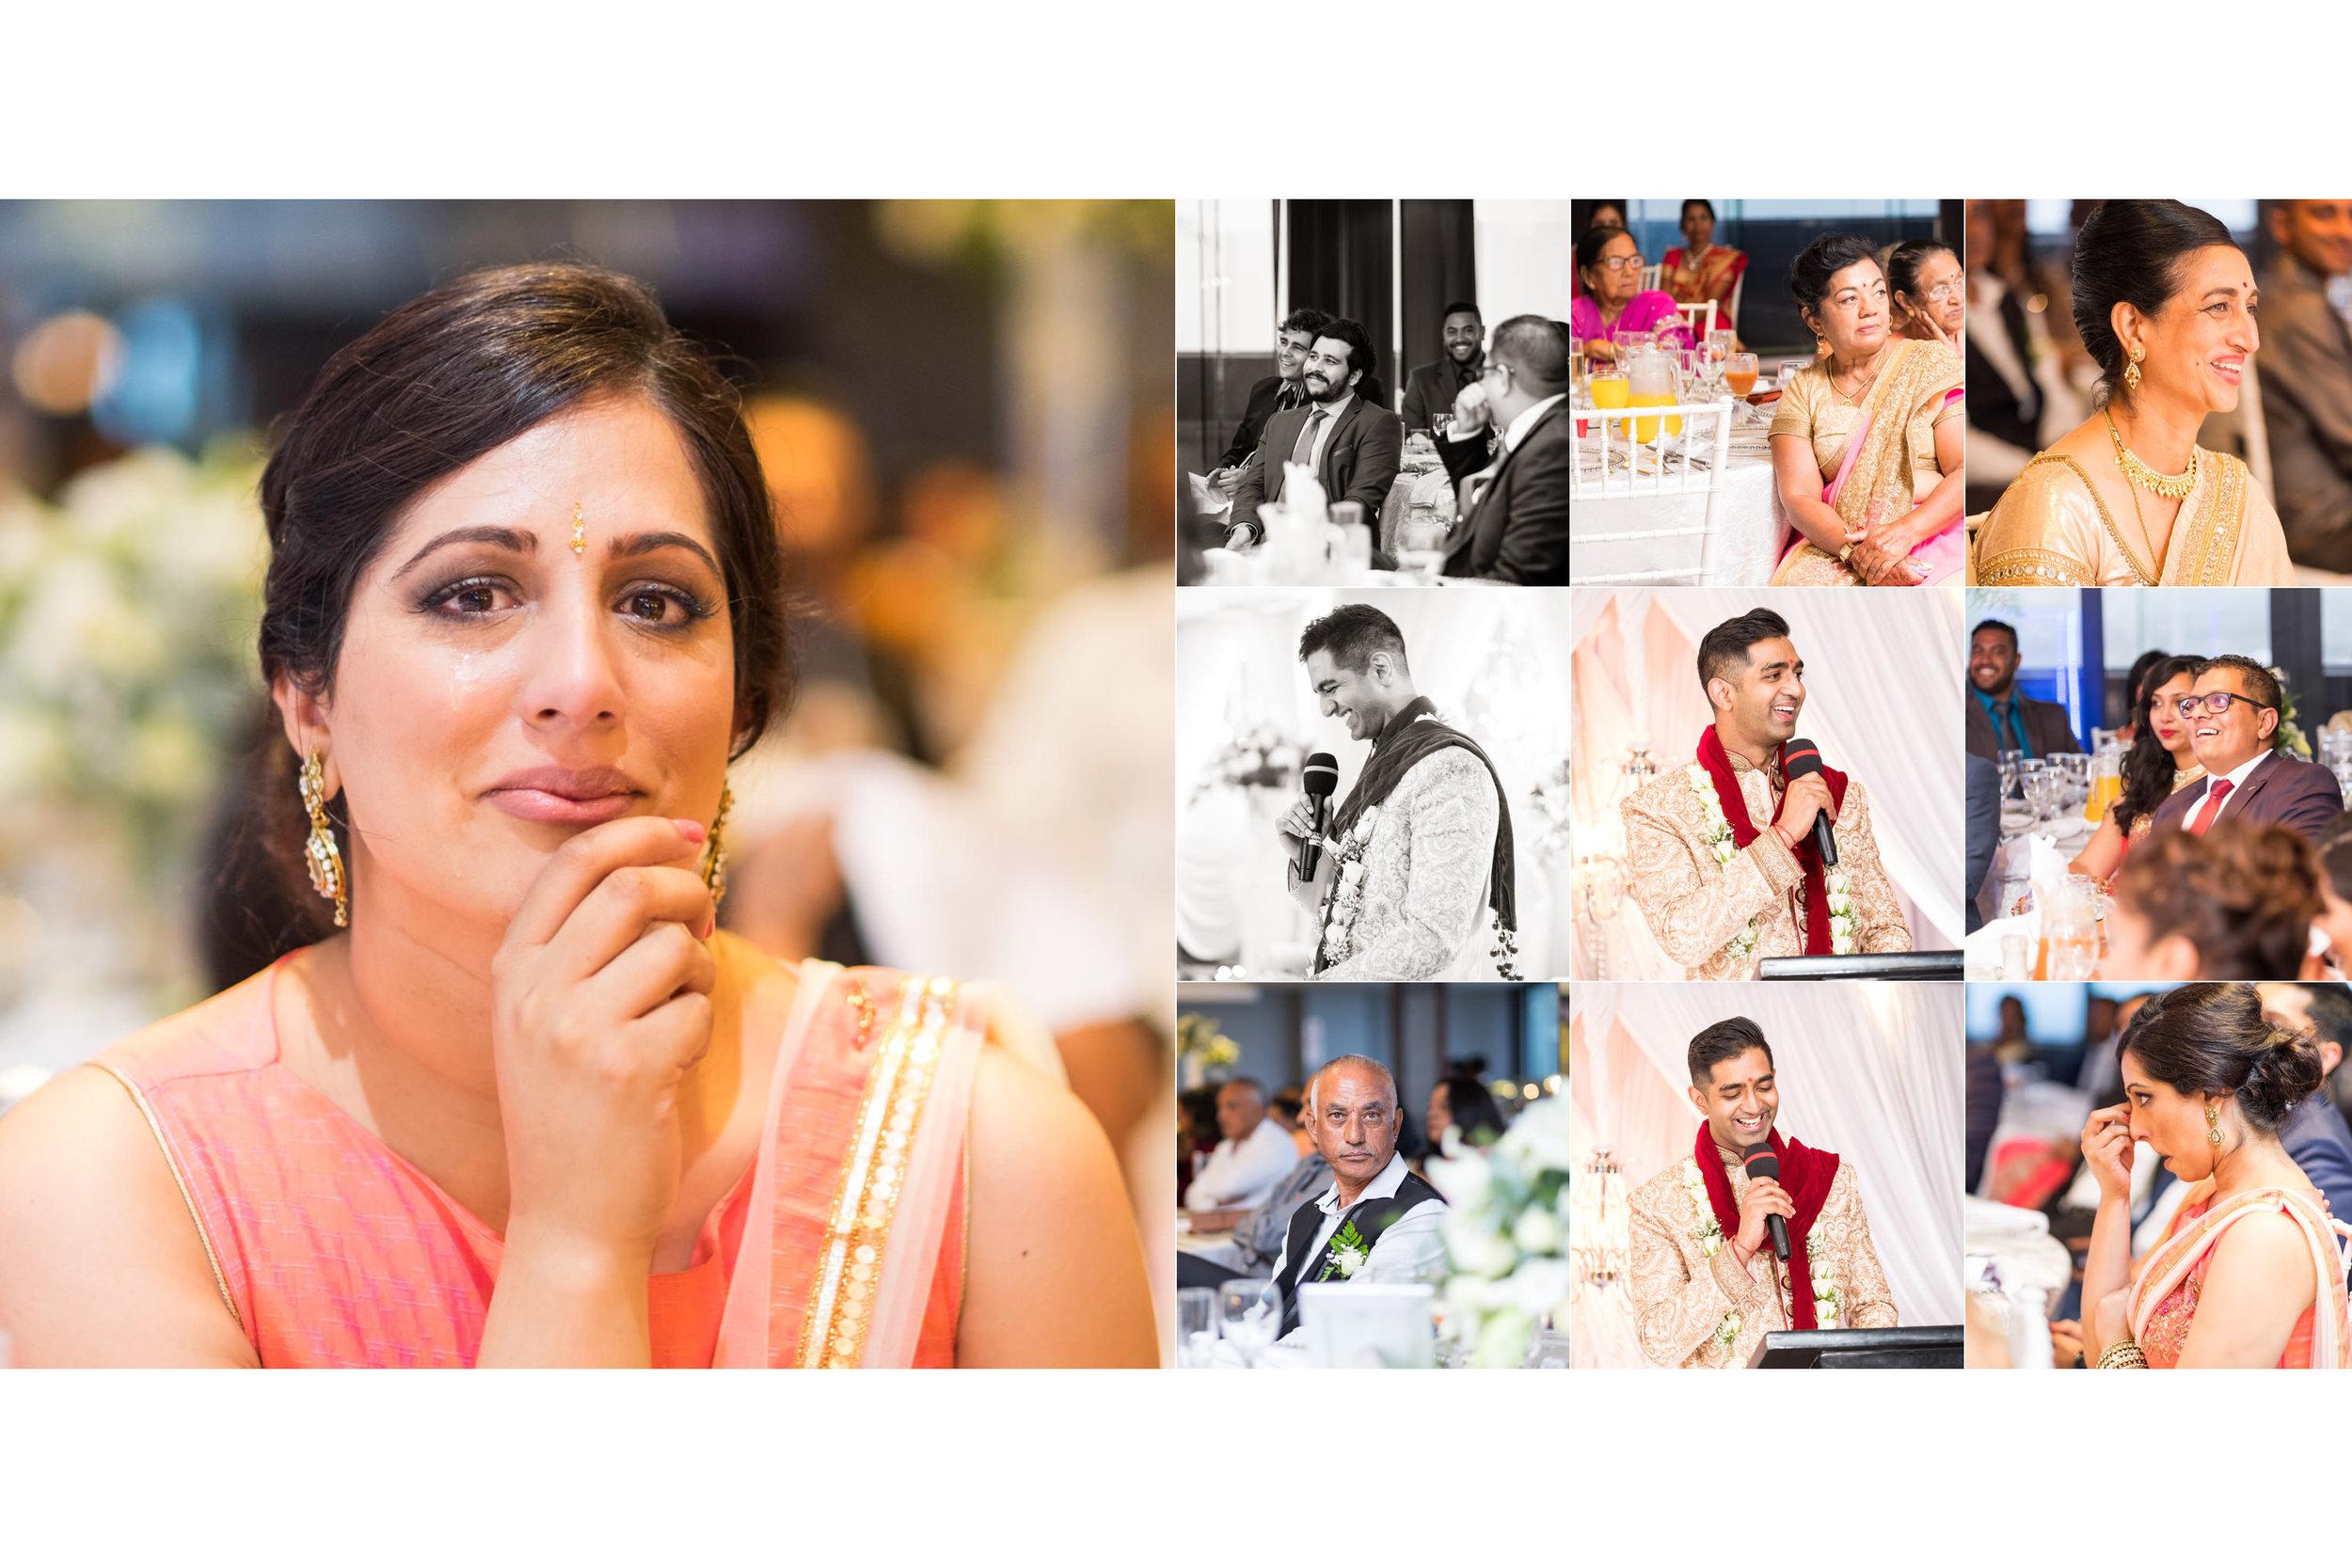 Umhlanga Wedding Photography Coastlands Hindu Ceremony